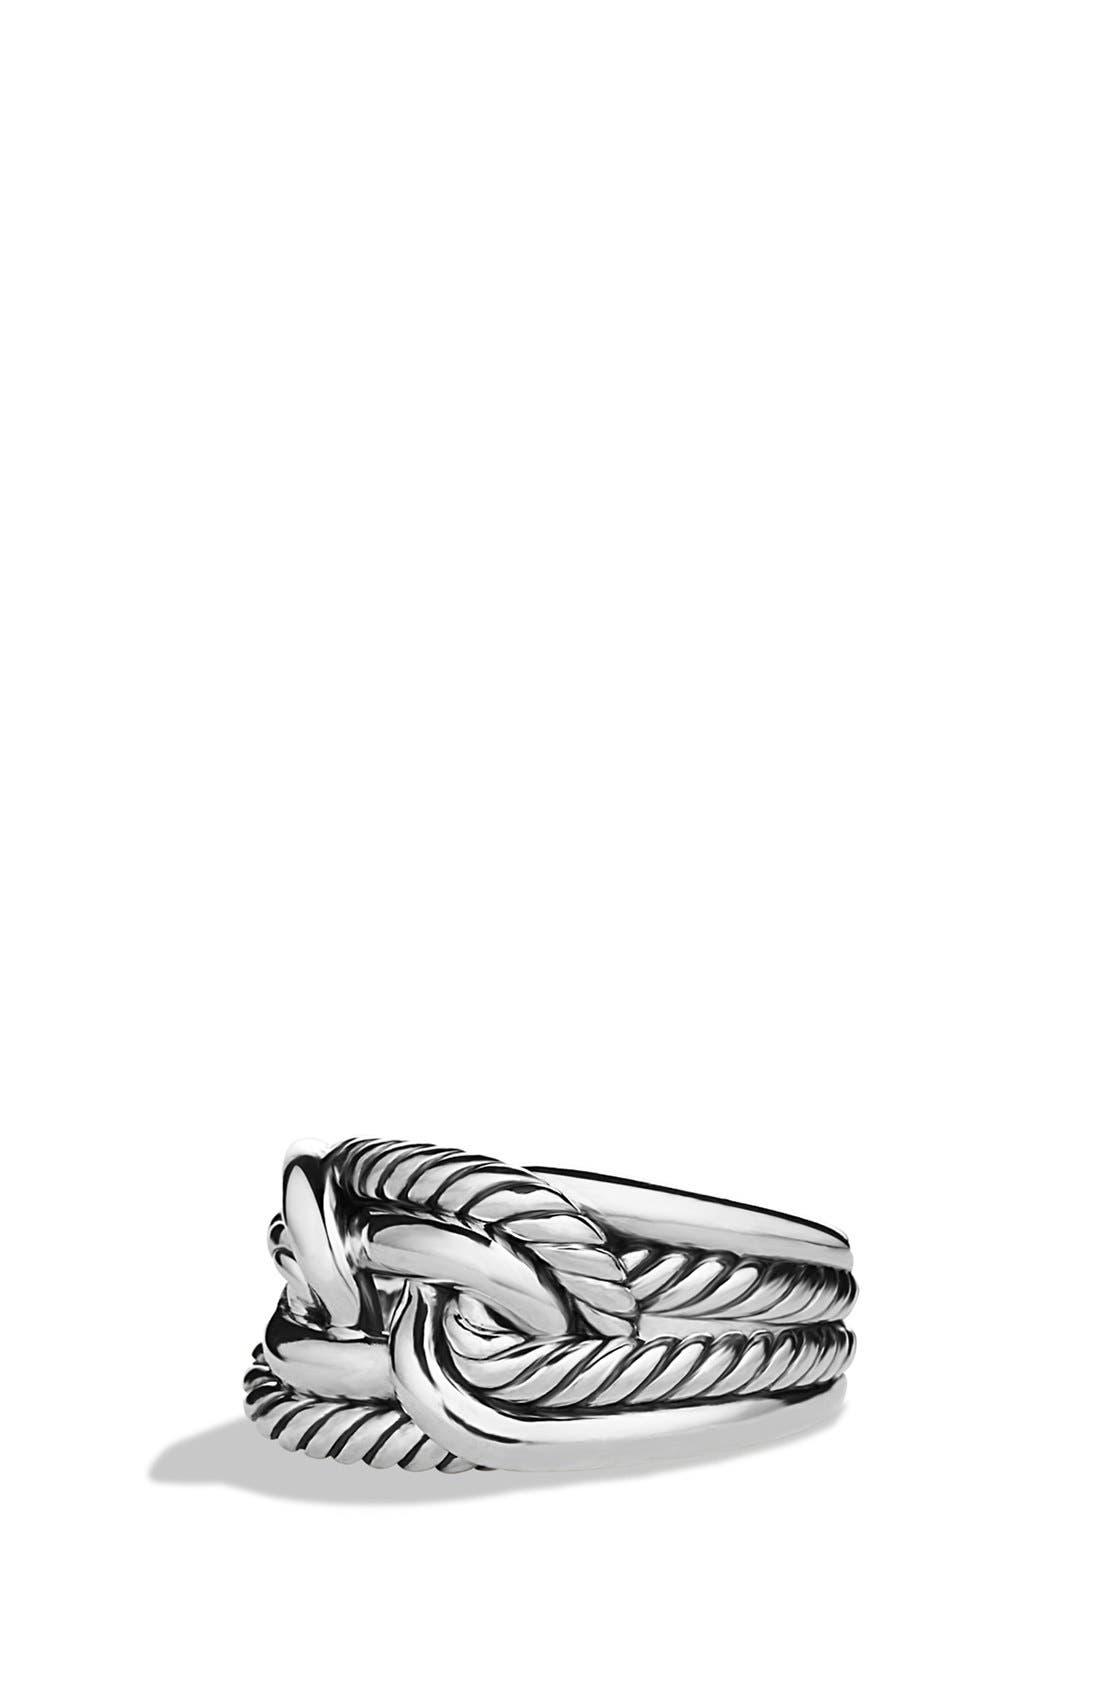 Alternate Image 1 Selected - David Yurman 'Labyrinth' Ring